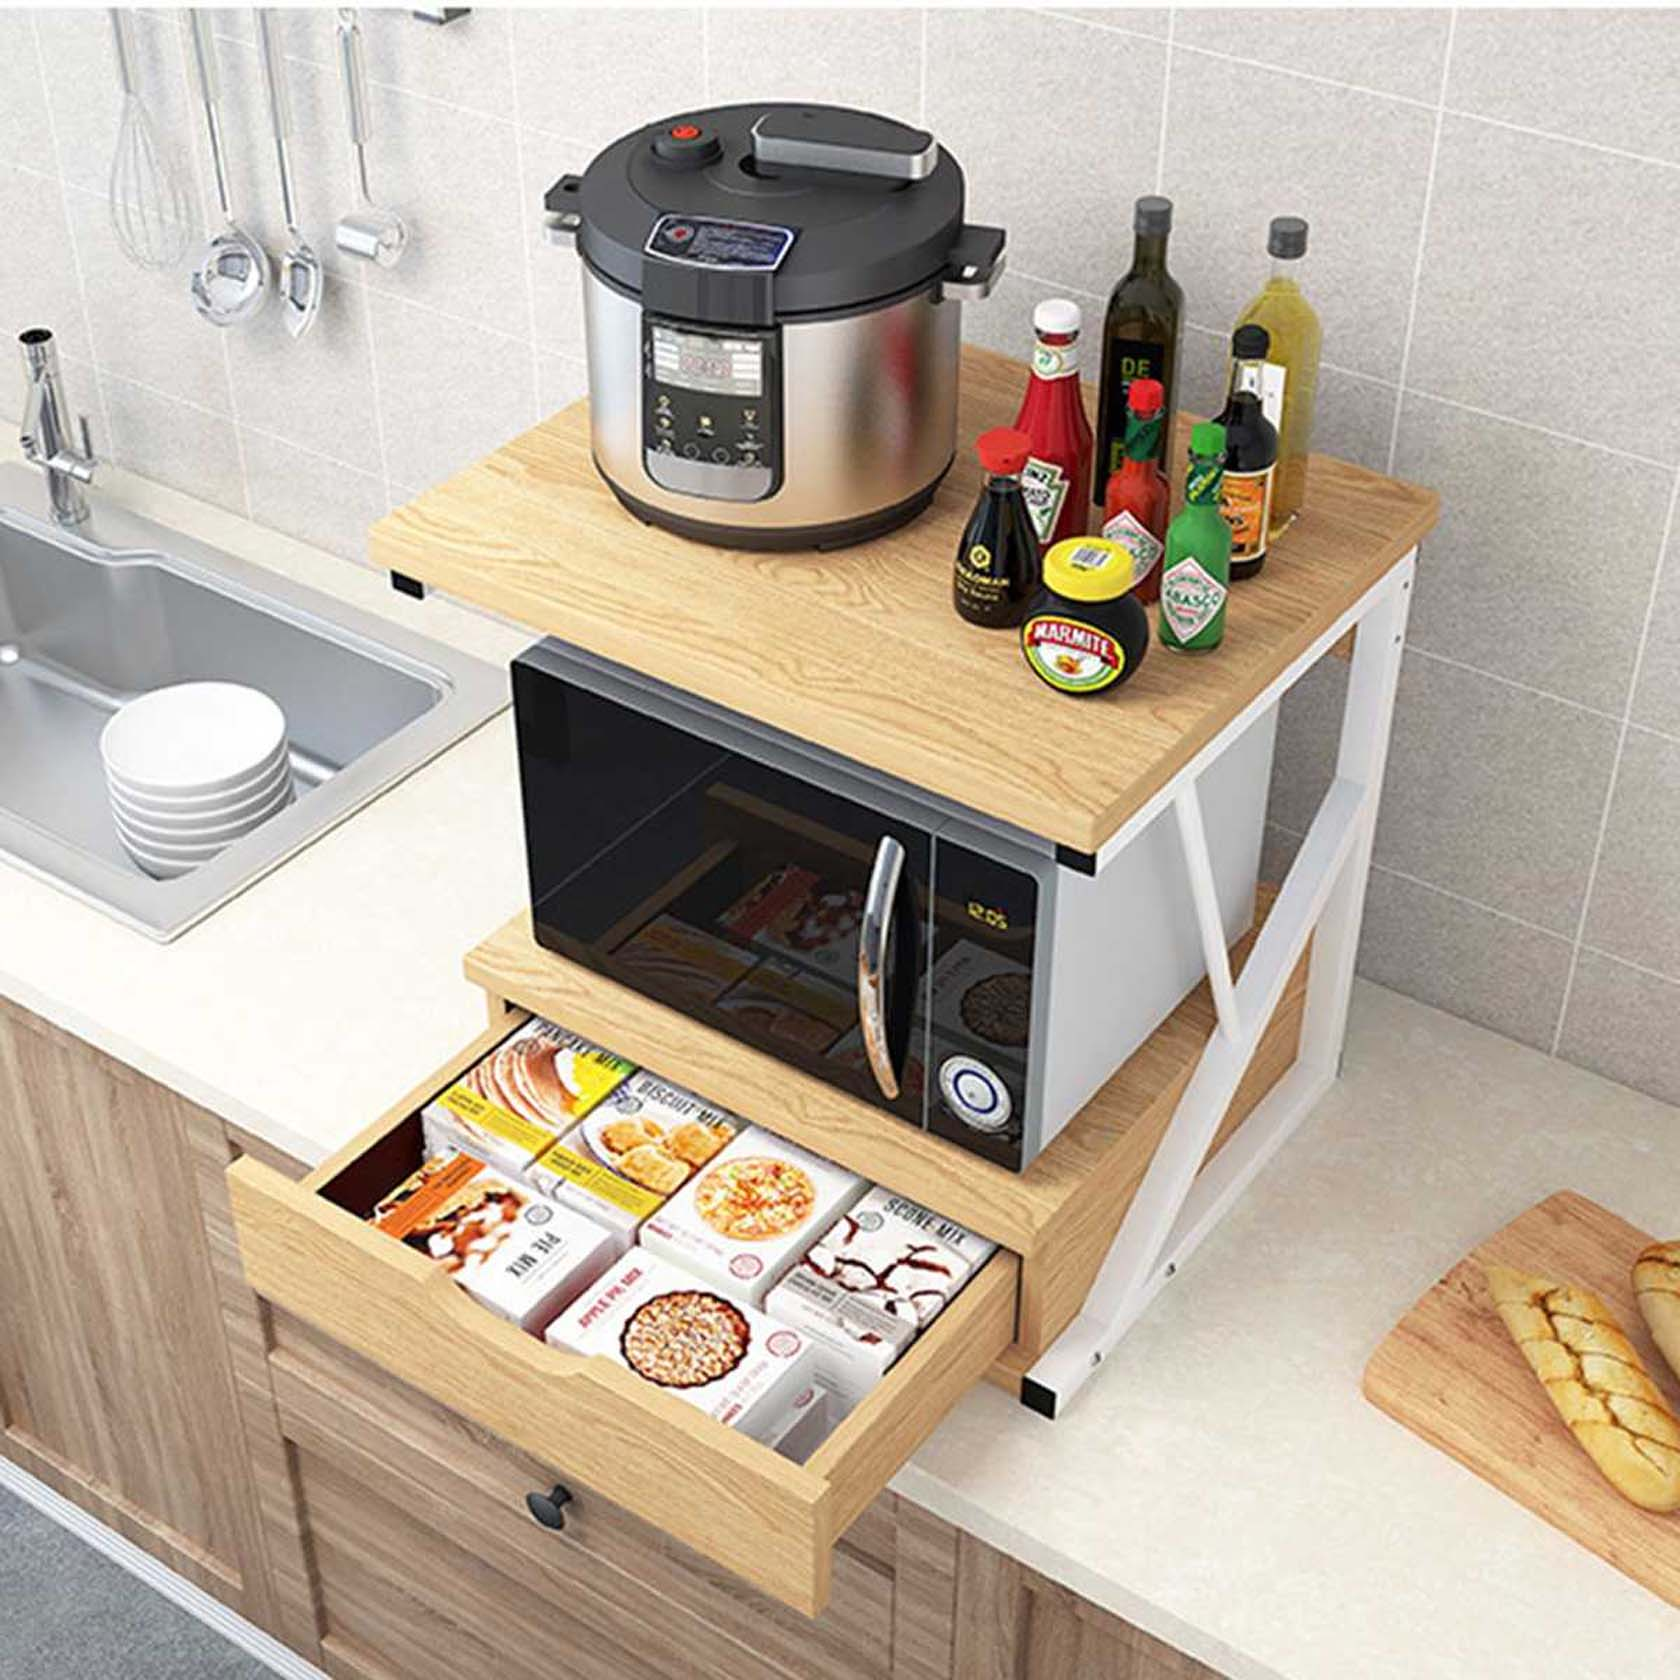 Types Of Mini Microwave